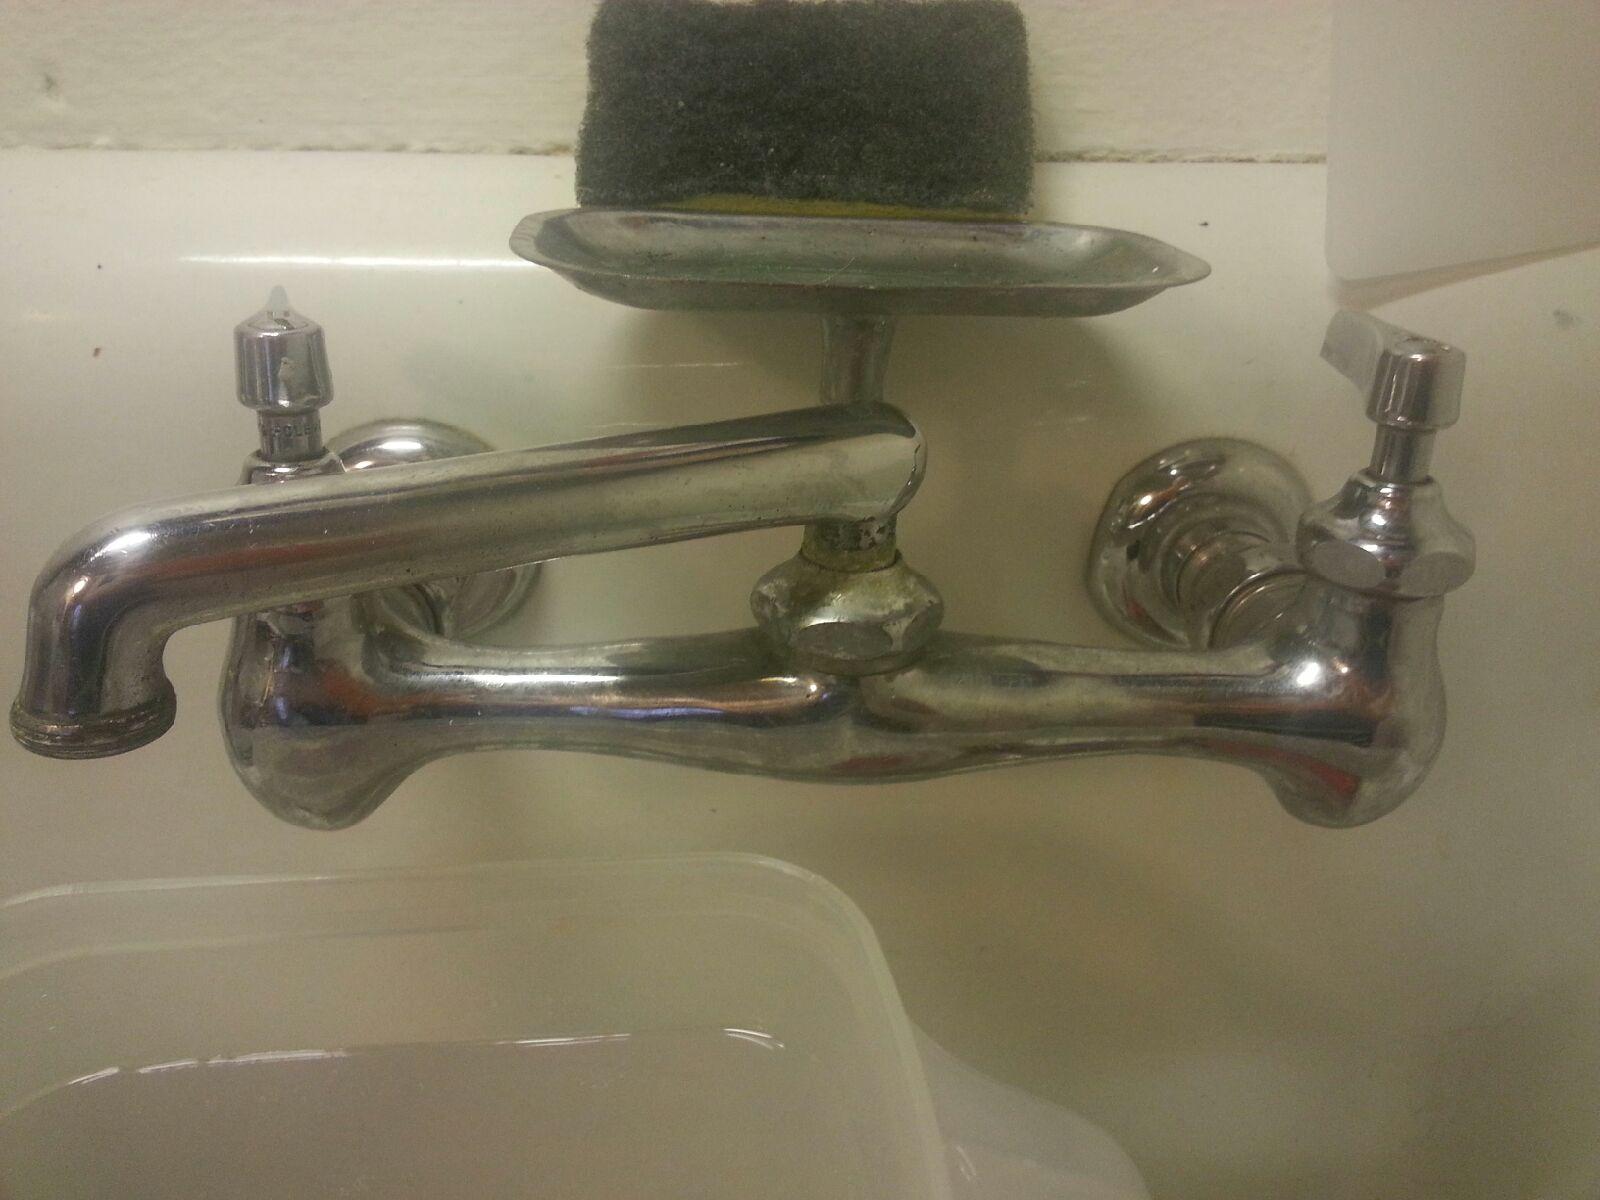 st louis park mn drain technician | Drain Cleaning Companies ...